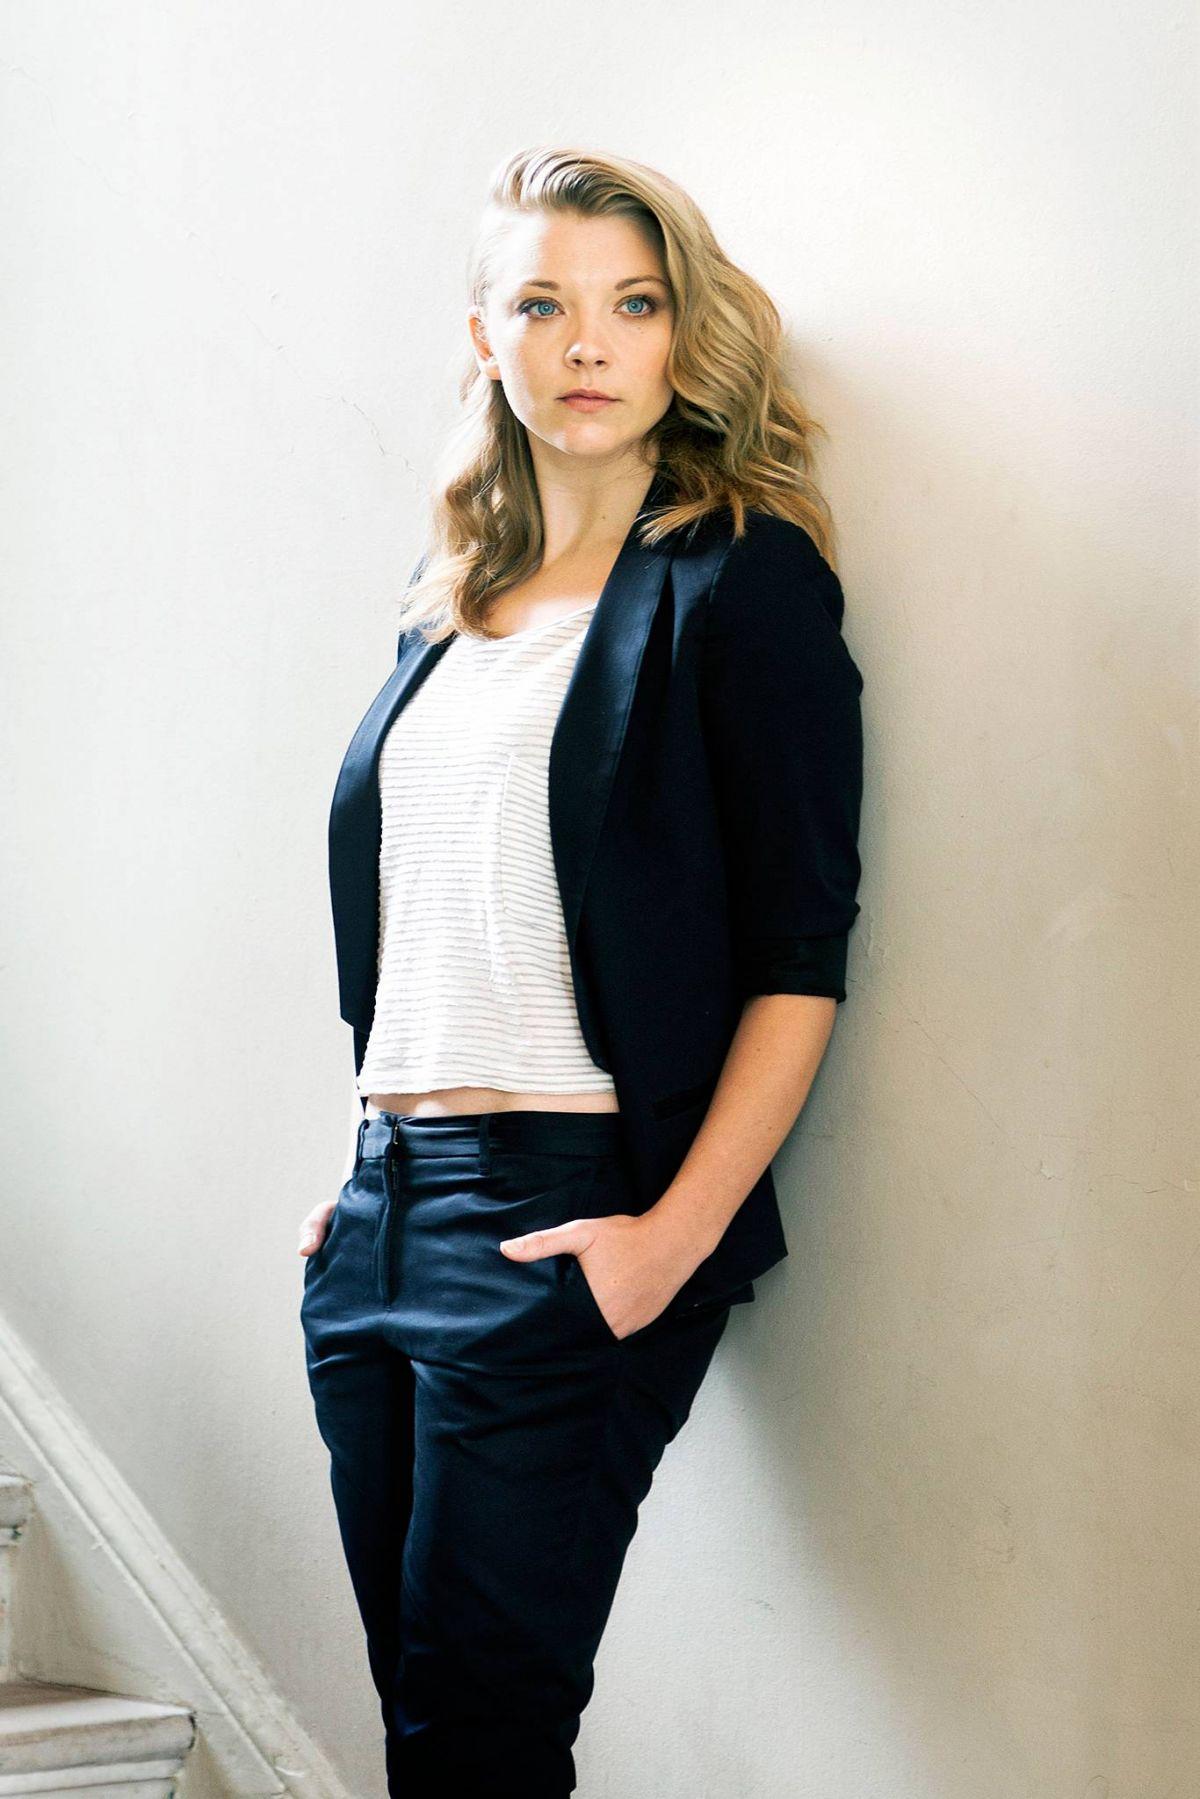 Natalie Dormer Fashion Magazine February 2016 Photoshoot: NATALIE DORMER For The Telegraph, August 2015